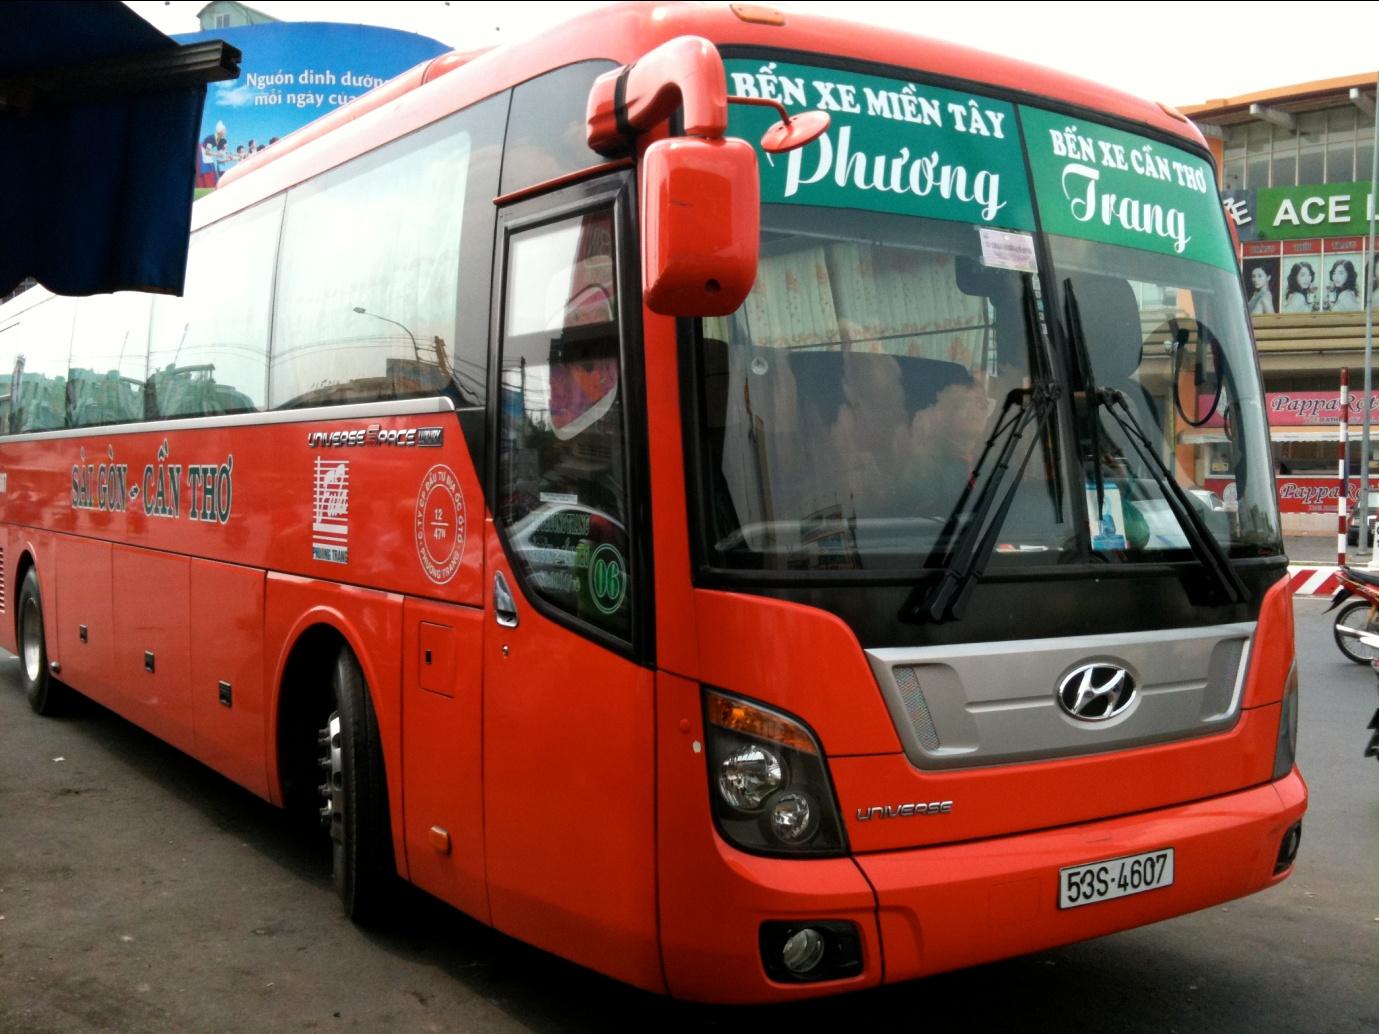 Phuong Trang bus from Ho Chi Minh City to Chau Doc